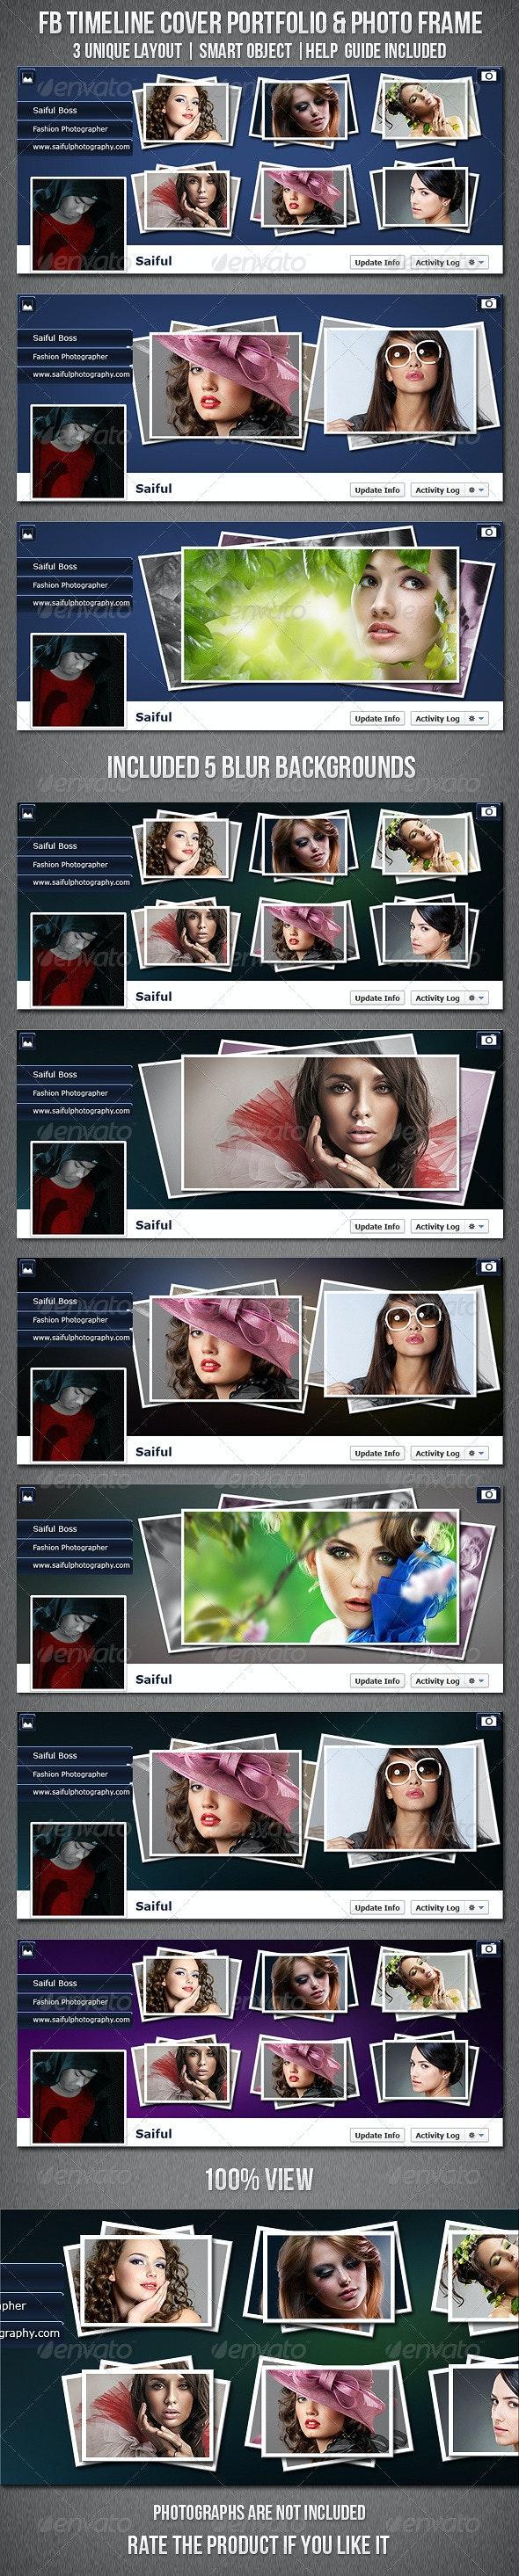 Facebook Timeline Cover Portfolio & Photo Frame - Facebook Timeline Covers Social Media